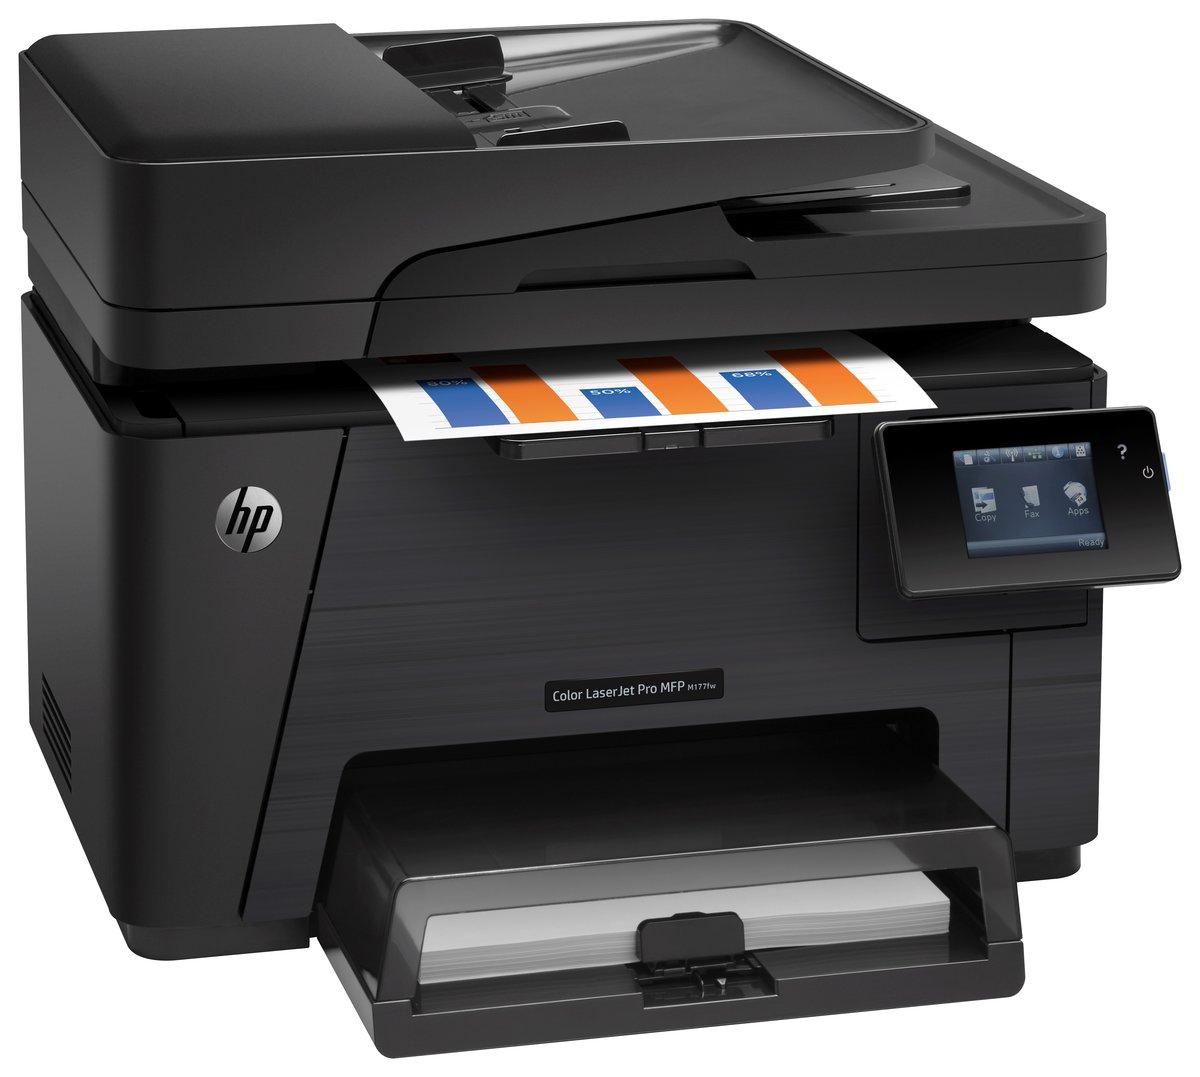 Color wireless printer laser - Hp Laserjet Pro Wireless Color Laser All In One Printer Copier Scanner Fax M177fw By Office Depot Officemax